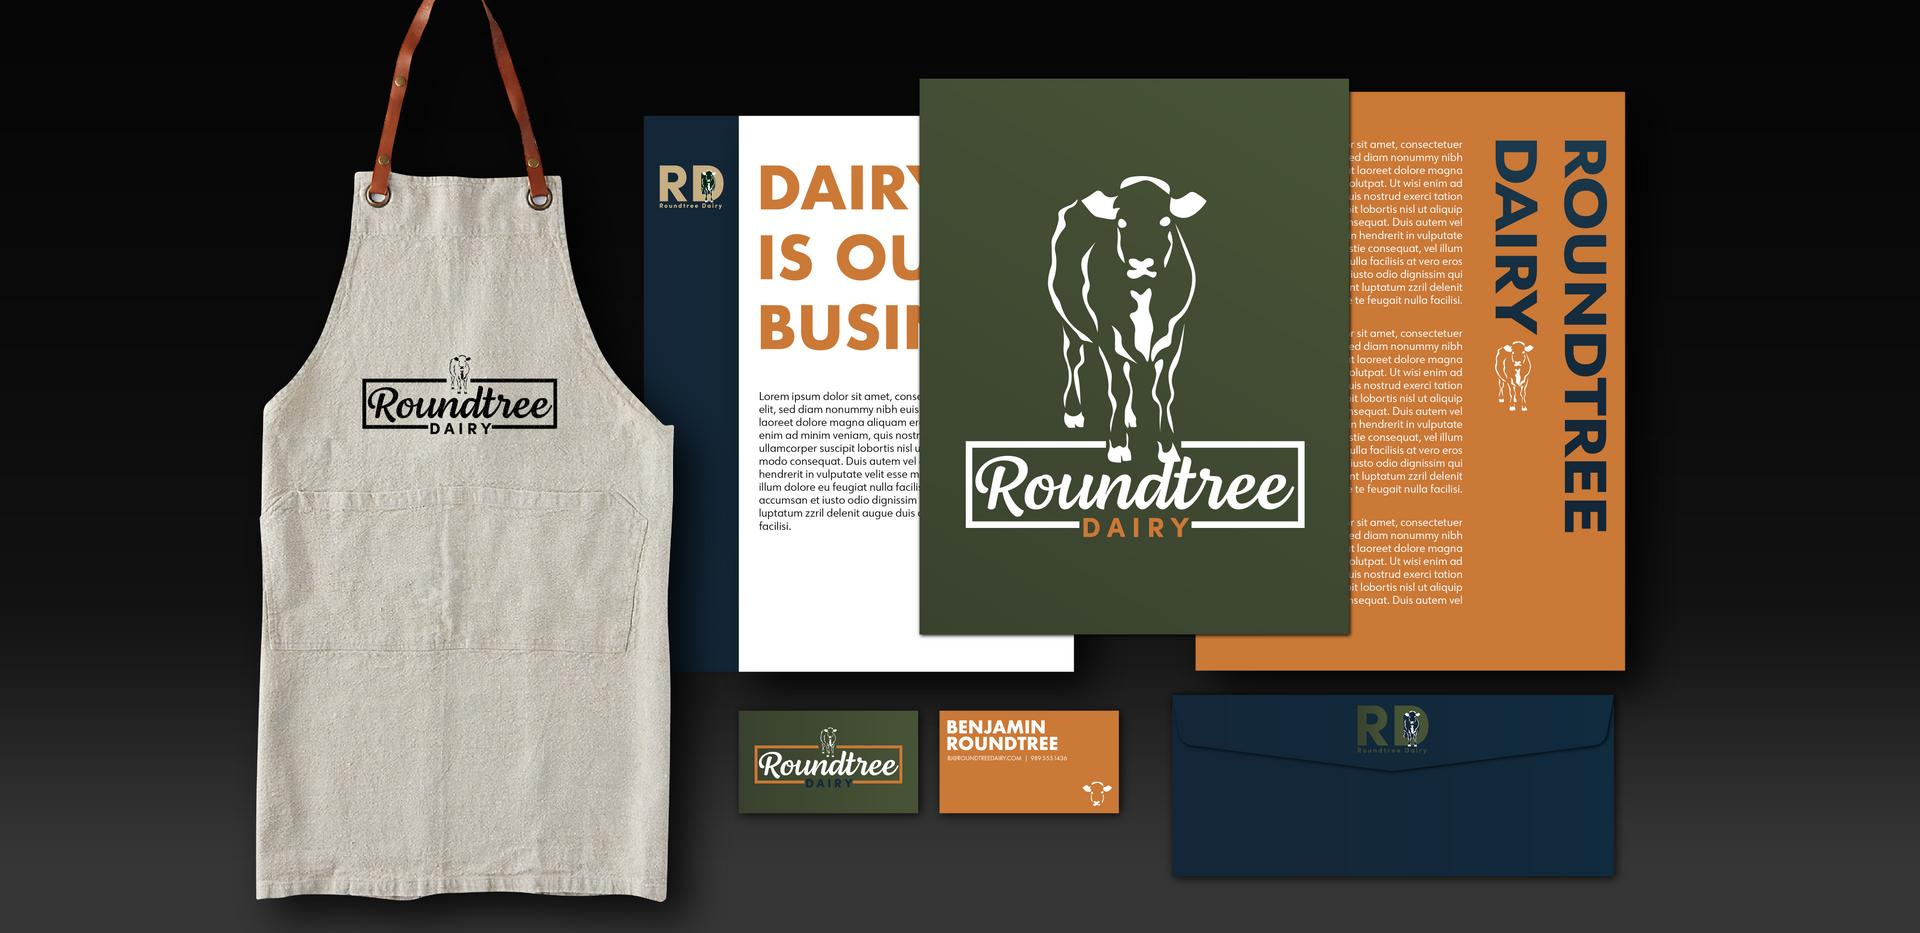 Roundtree Dairy